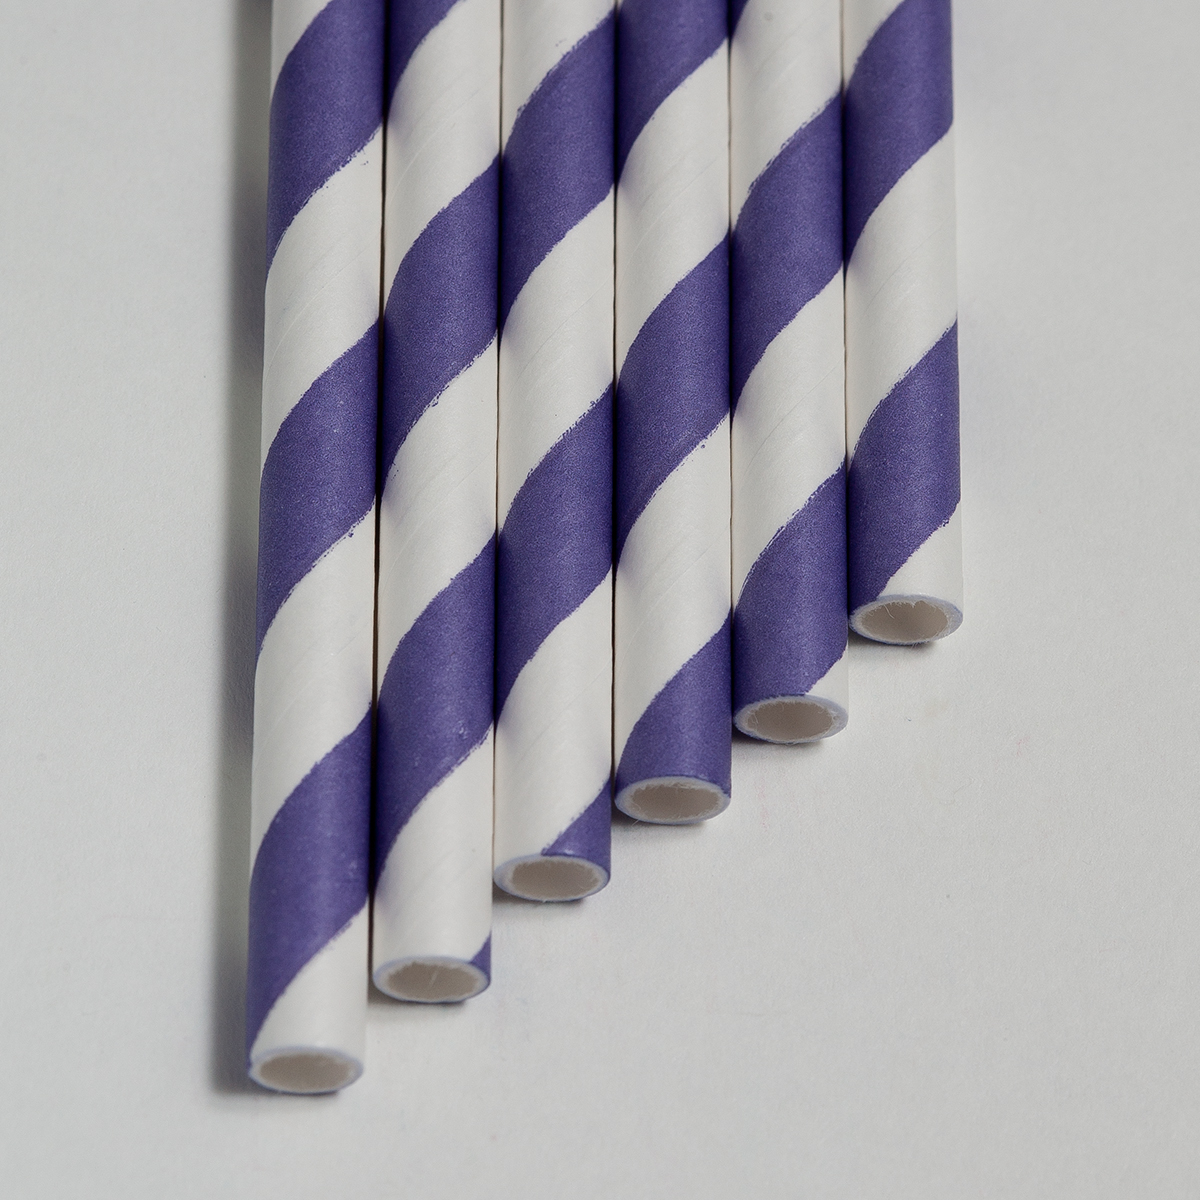 Purple-Lined0001.jpg